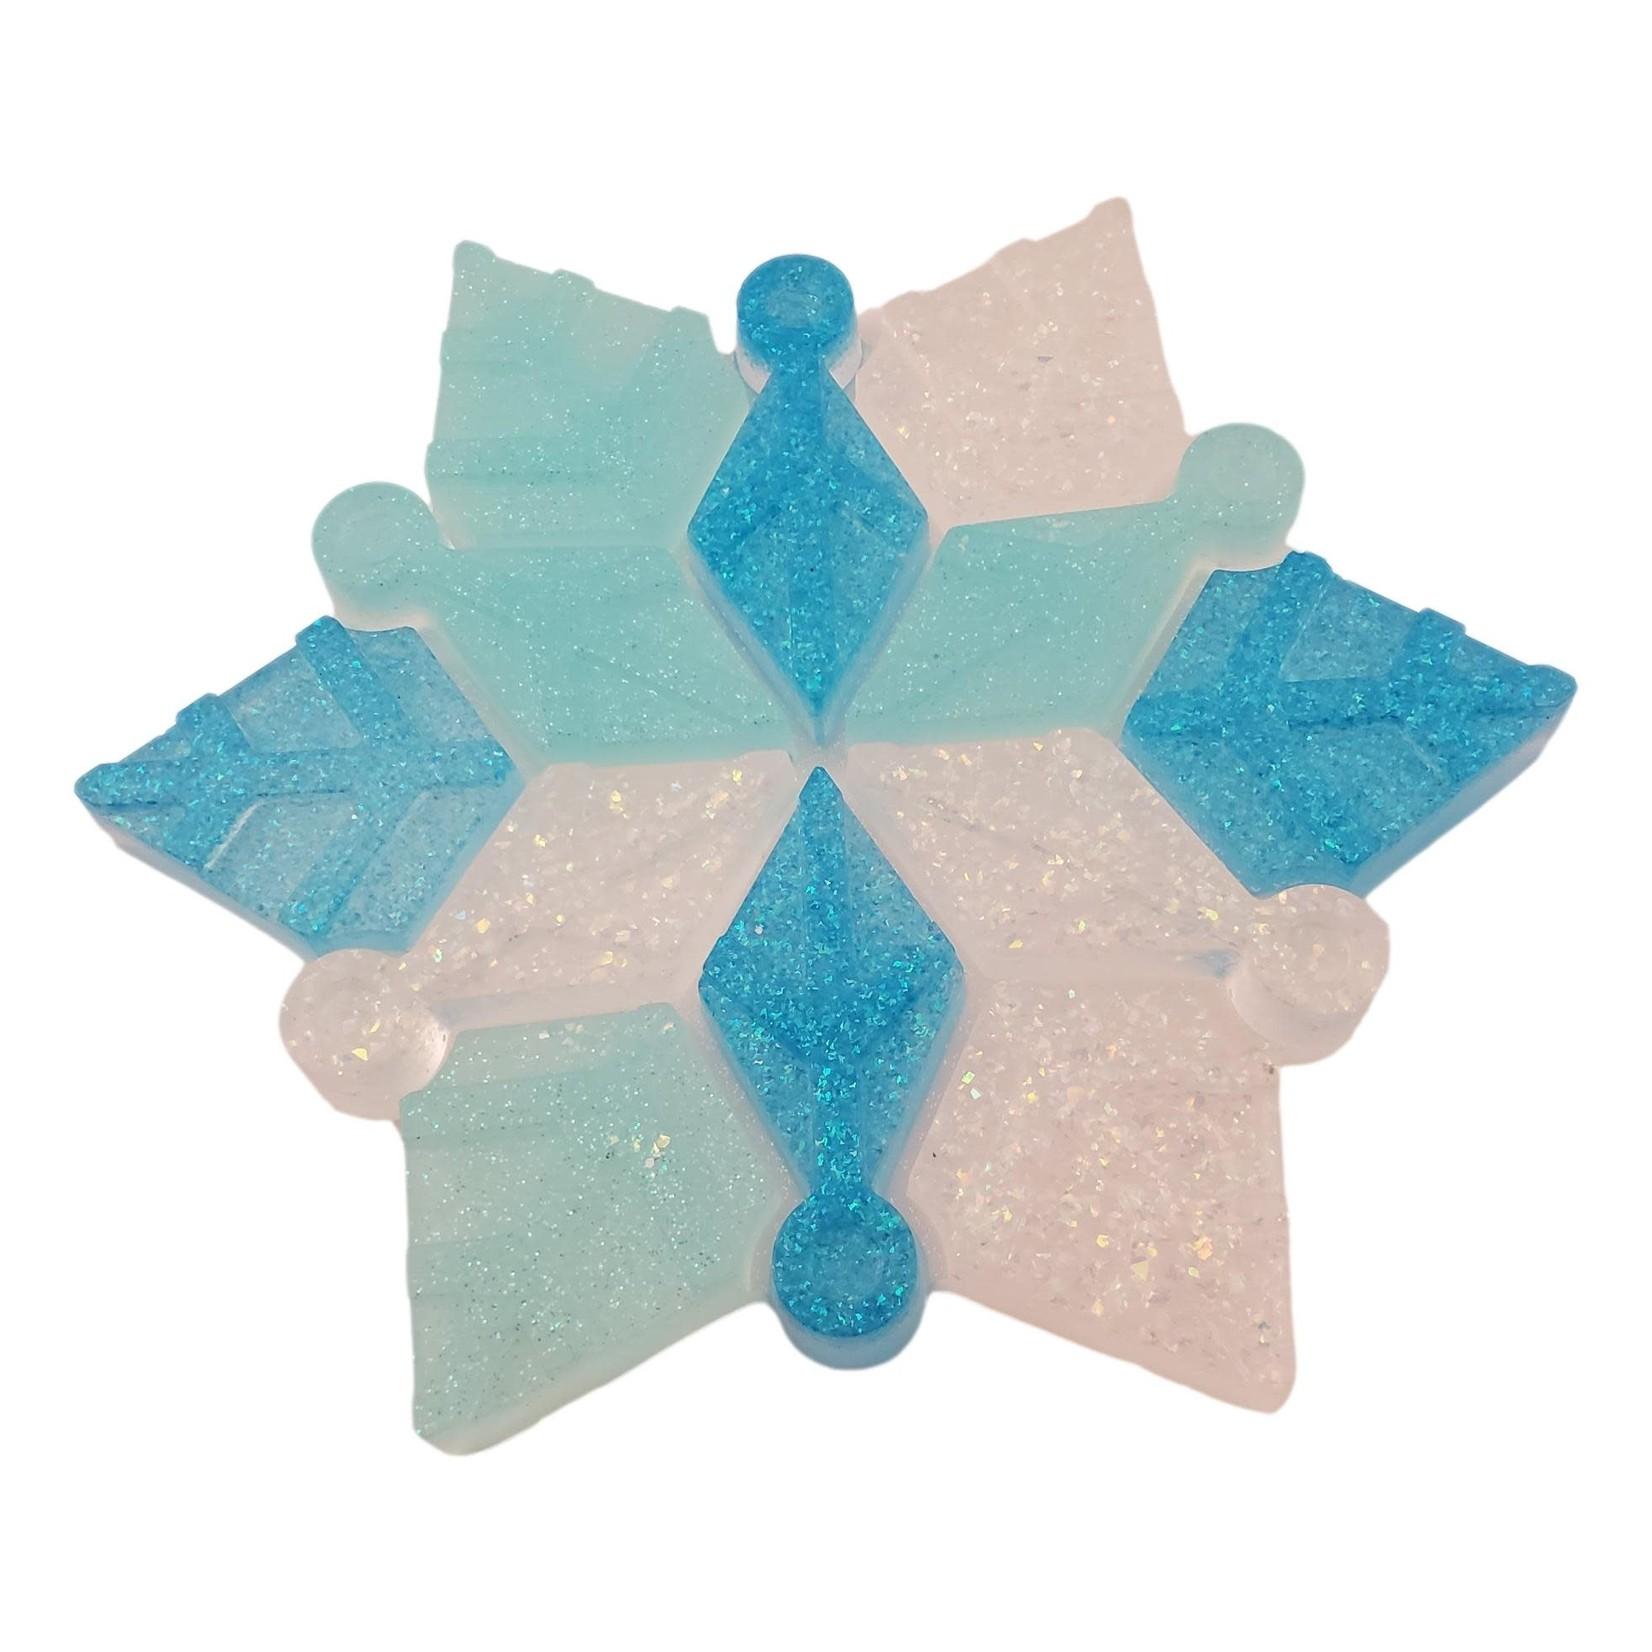 East Coast Sirens Hanging Snowflake Ornament